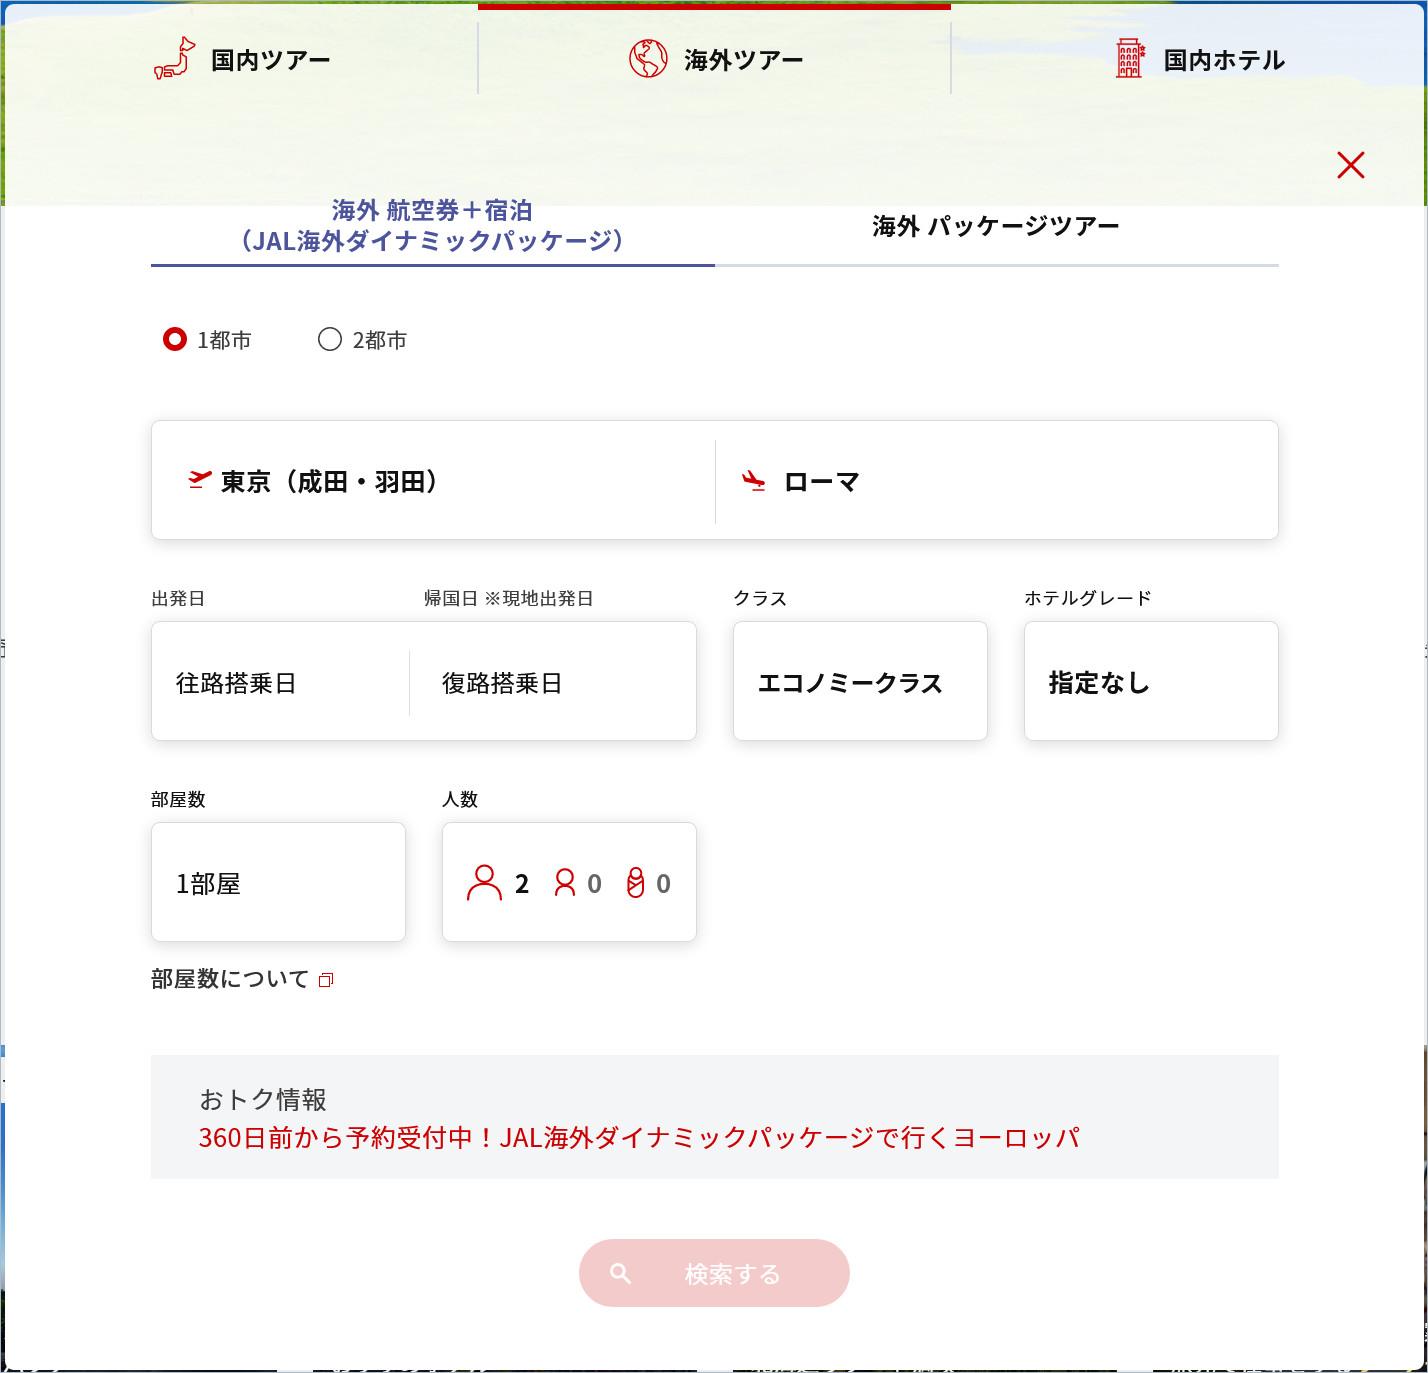 JALのダイナミックパッケージツアー検索画面